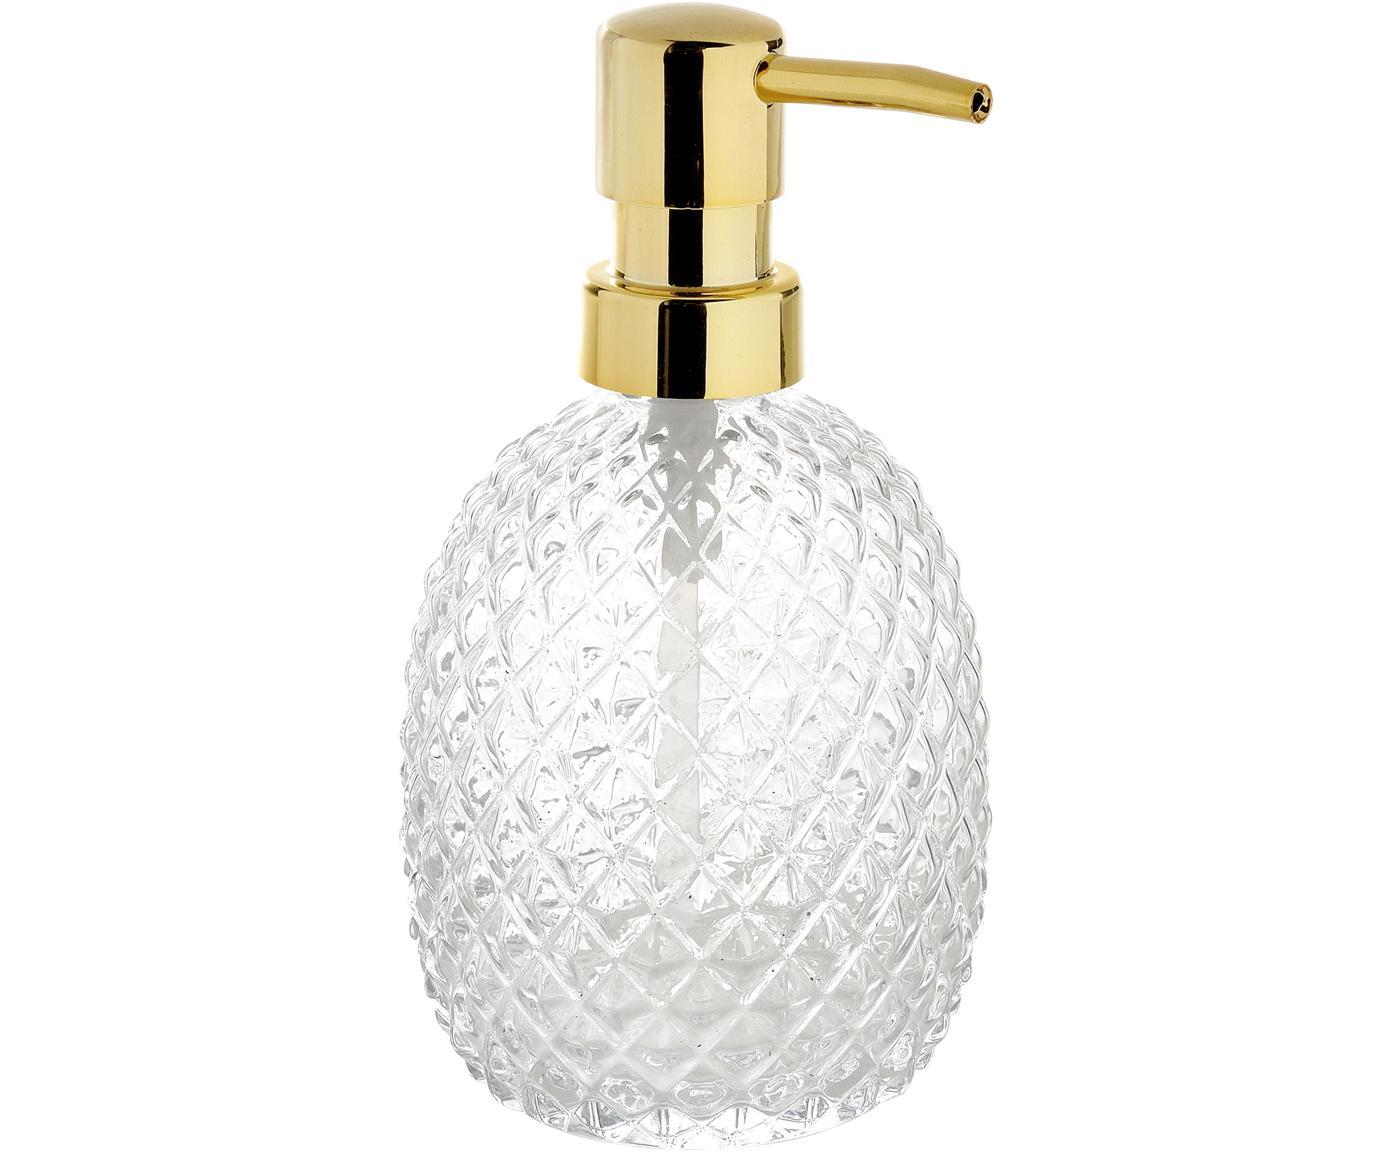 Dosatore di sapone in vetro Diamond, Trasparente, Ø 9 x Alt. 16 cm